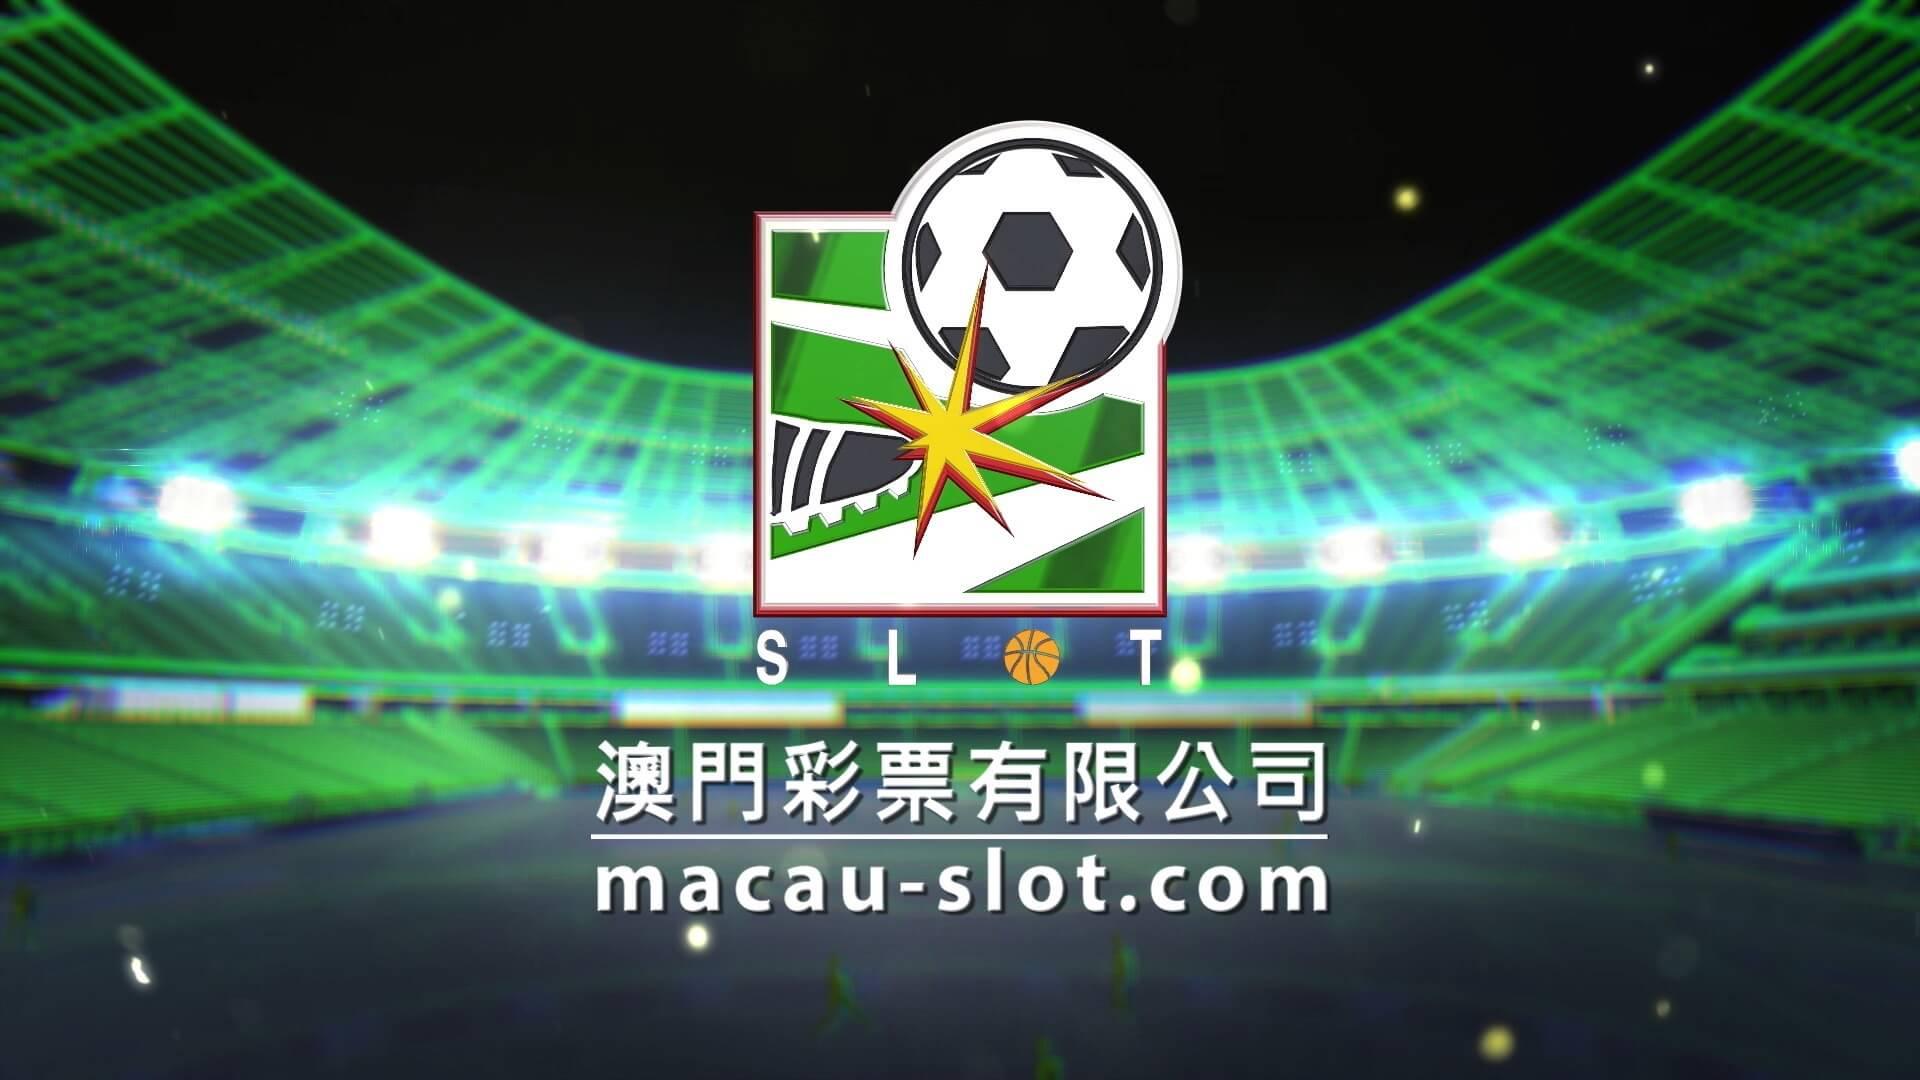 Image Result For Macau Slot Football